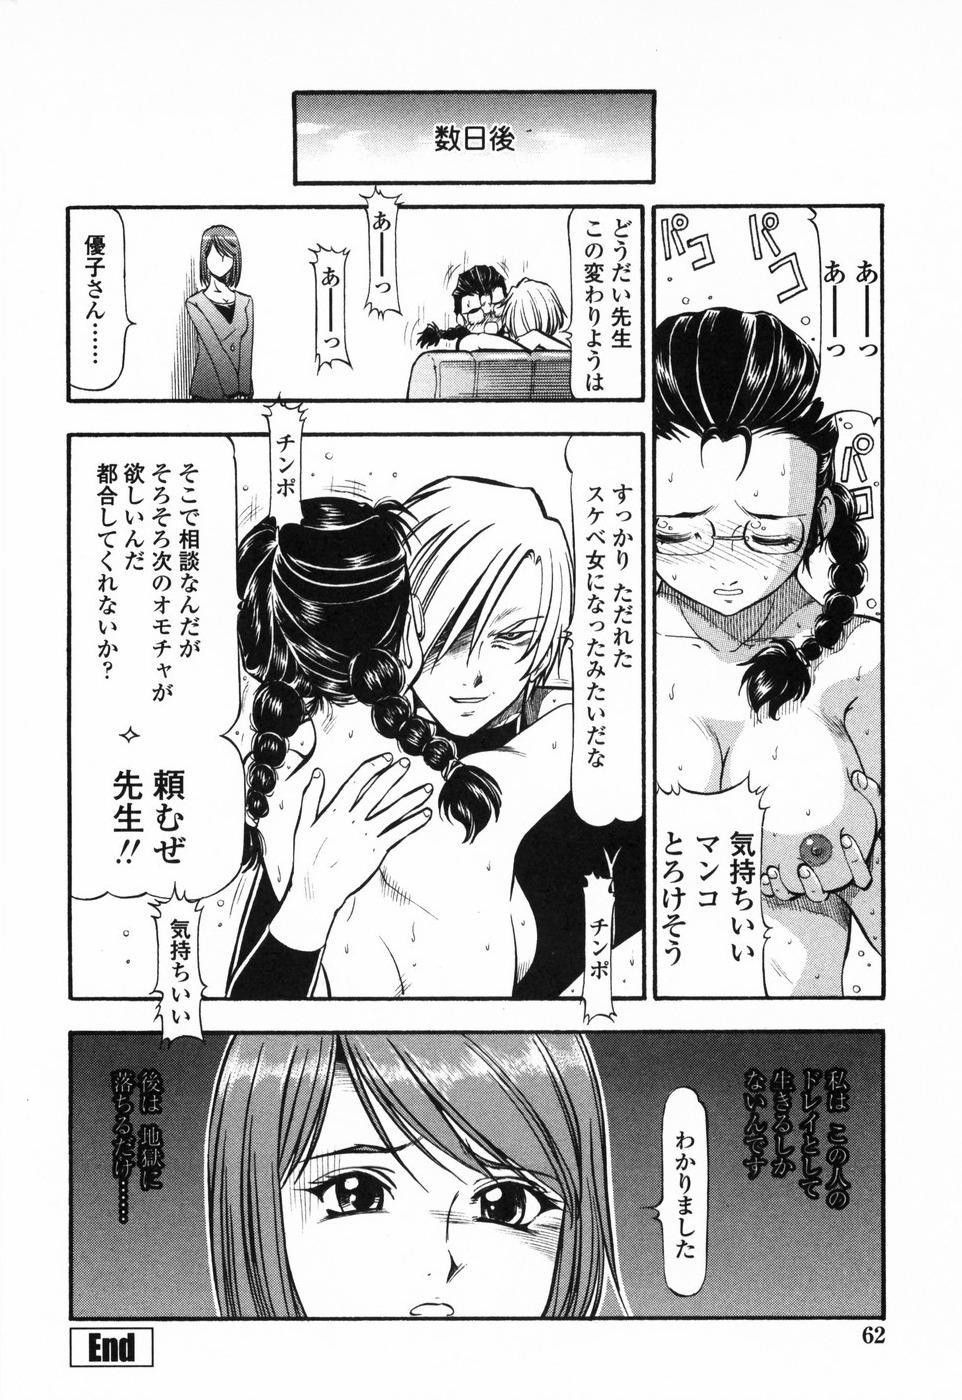 Kichiku Houteishiki - Equation of brutal person 67